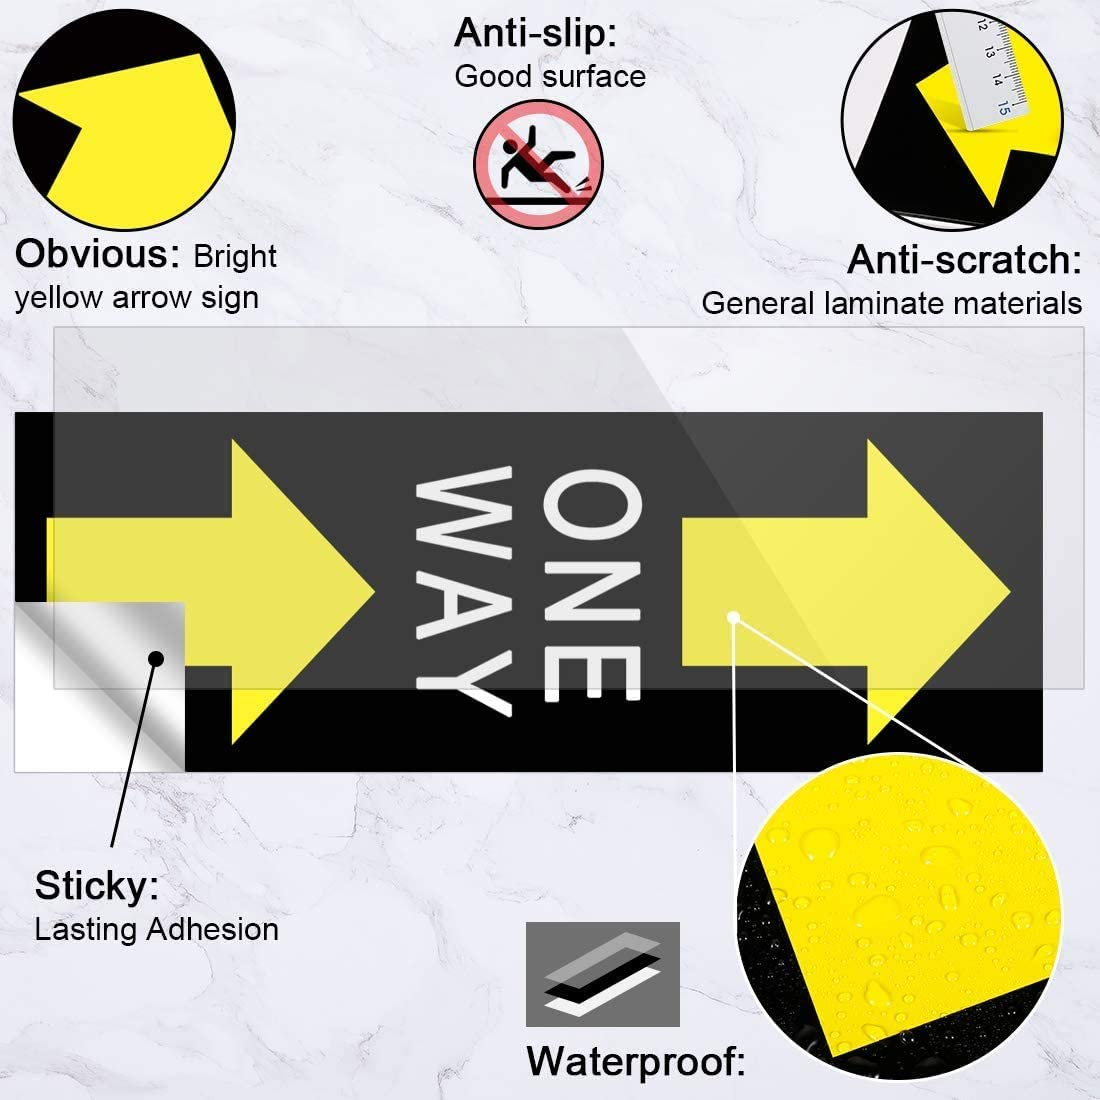 One Way Social Distance Floor Stickers Decals,6x18 inch Waterproof Vinyl Safety Distance Floor Sign Markers Commercial Grade Material 15Pack Directional Floor Arrow Stickers Decals